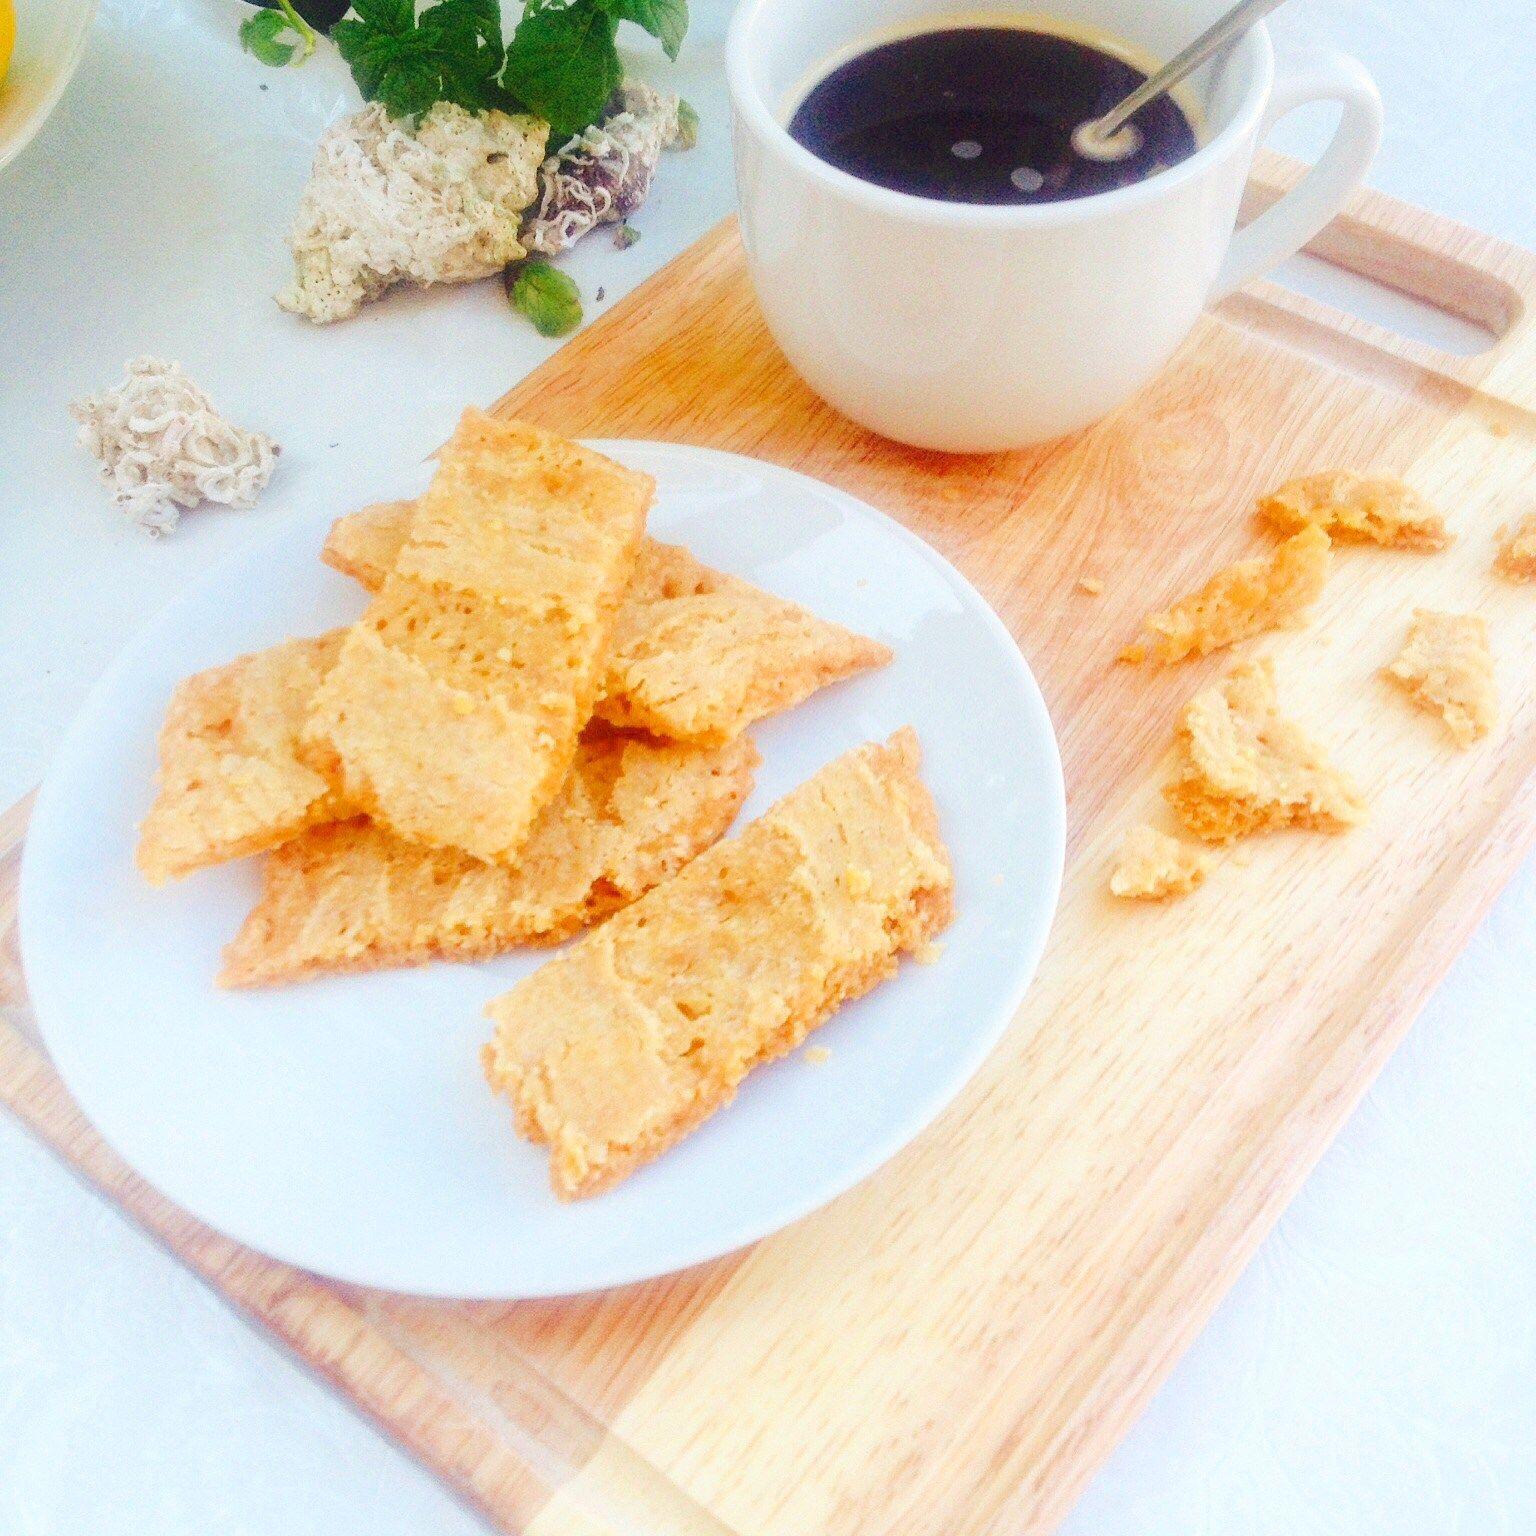 glutenfria recept blogg